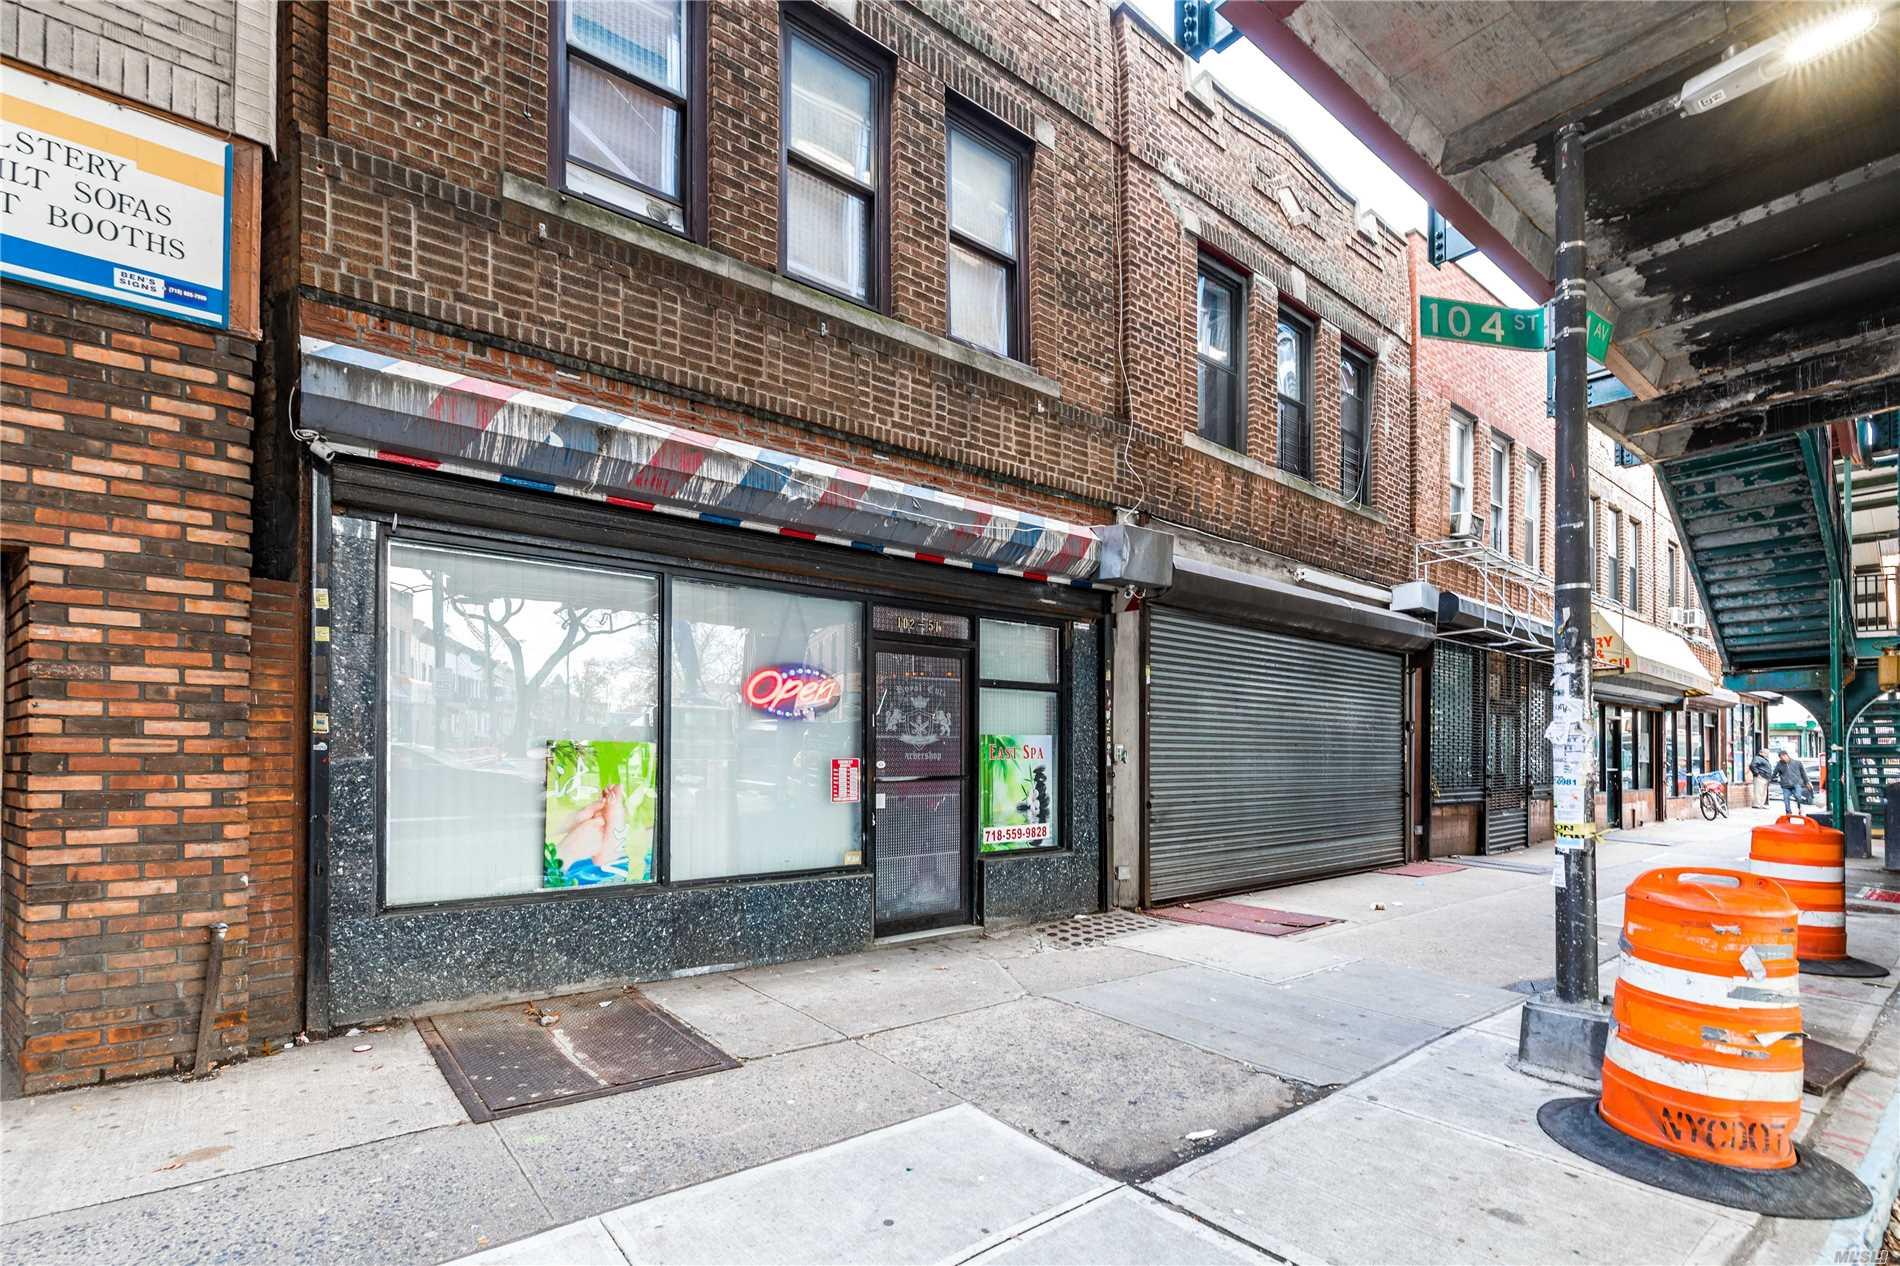 102-51 Jamaica Ave - Richmond Hill, New York